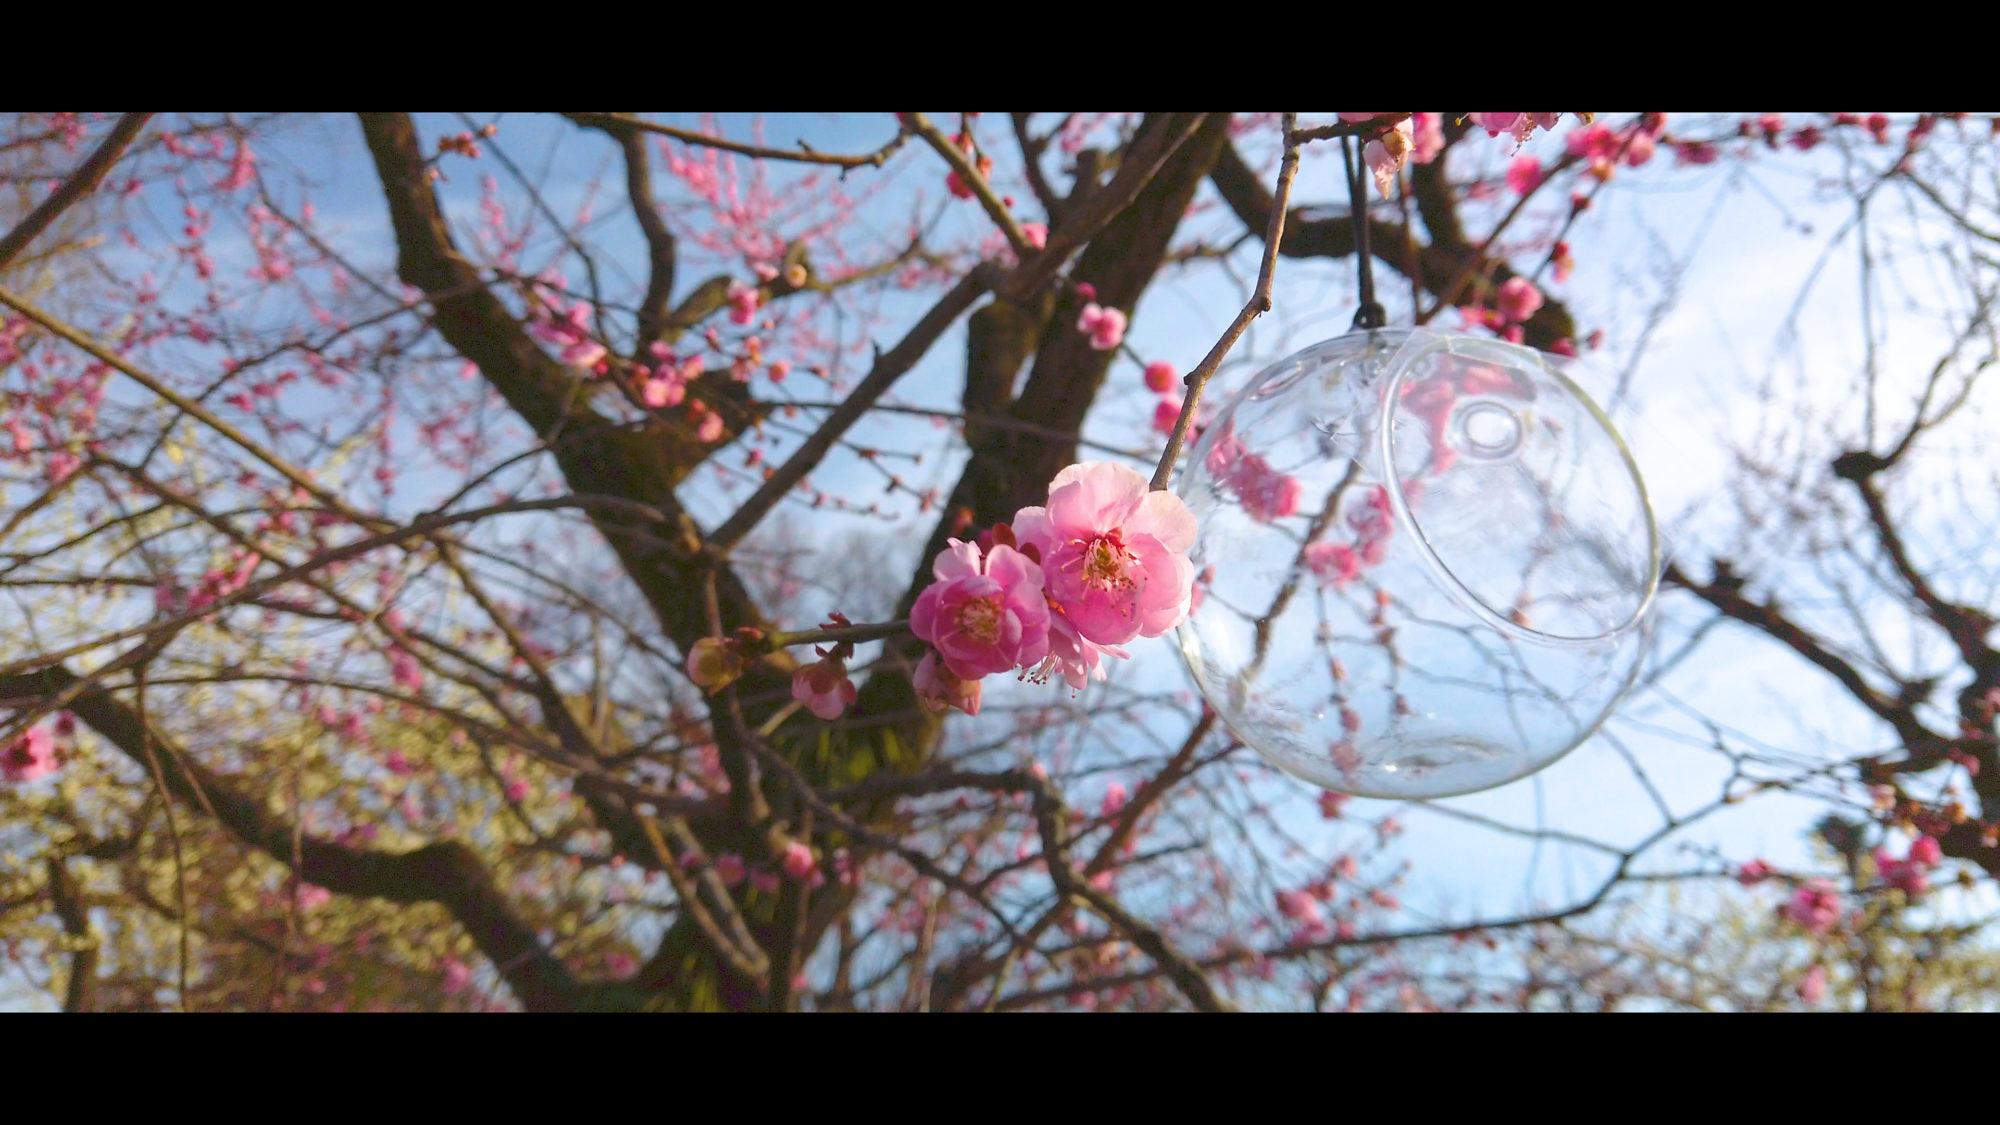 831b33430b367dfe59b2e15eebfe5fff-e1582382845551 京都府 北野天満宮 Kitano Tenmangu (2020年 京都の春におすすめ梅苑・梅林スポット! 撮影した写真の紹介、ライトアップ・アクセス情報や交通手段・駐車場情報などまとめ)